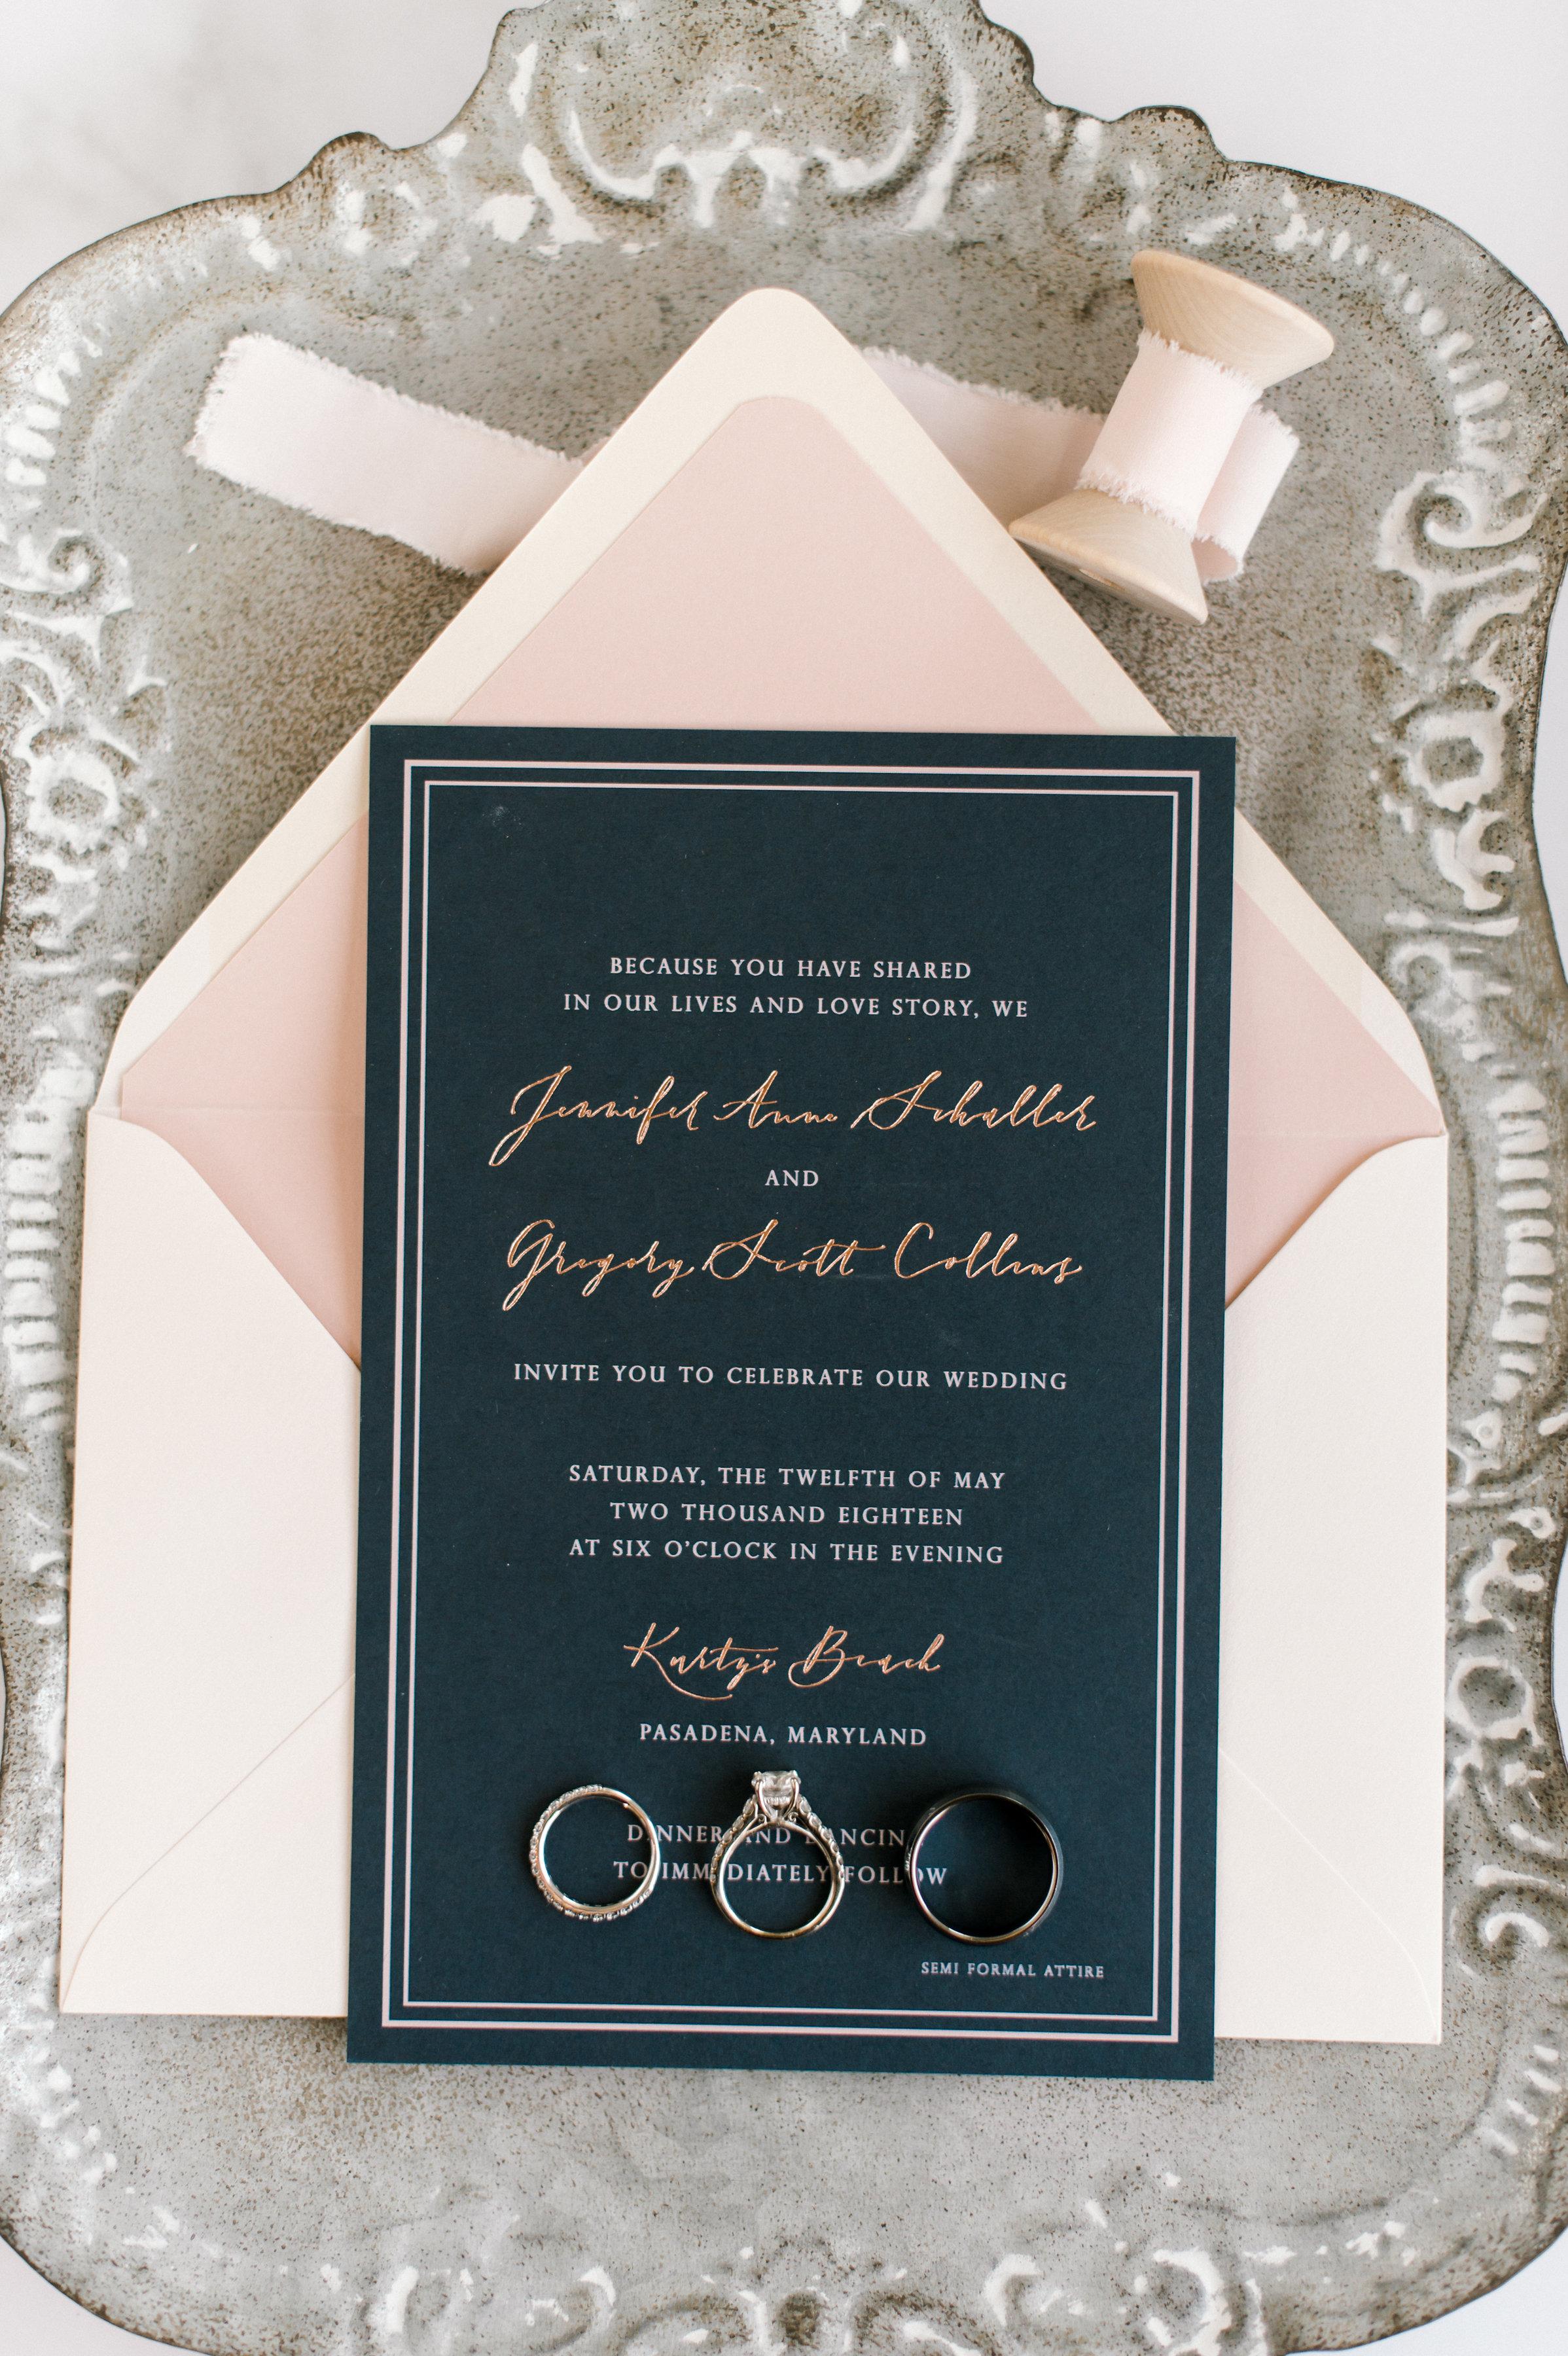 rose-gold-wedding-invitation-third-clover-a-er-.jpg